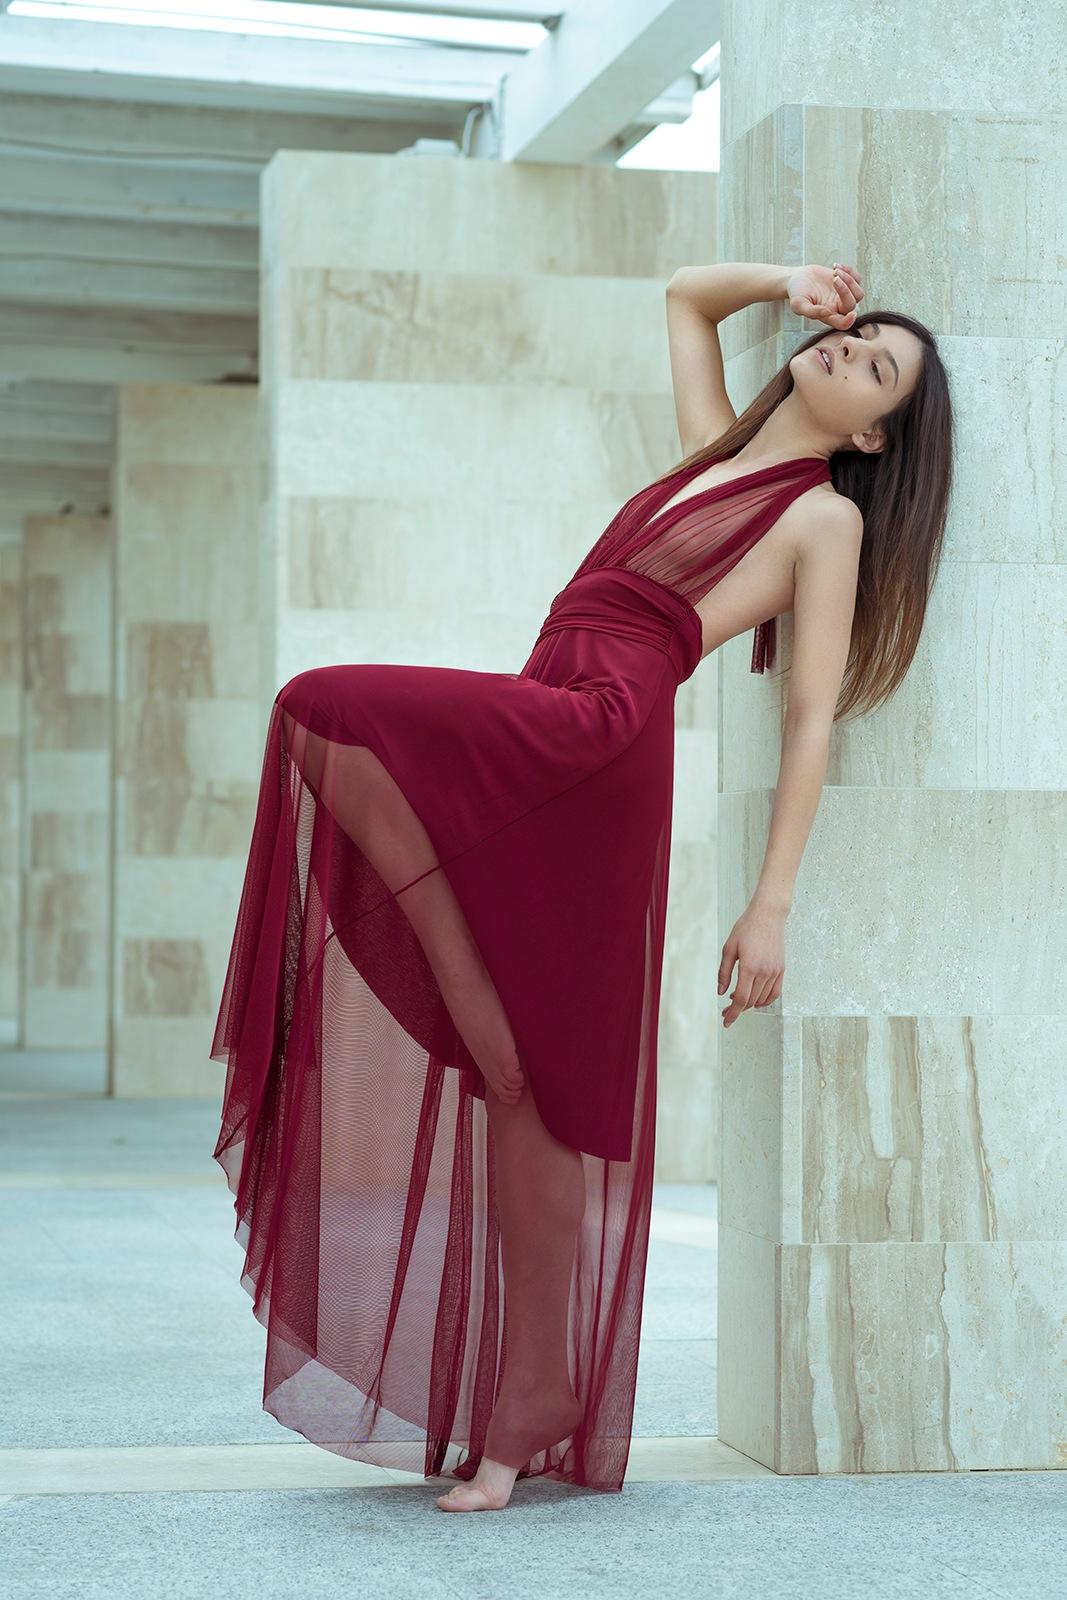 Red dress by Sergio Derosas